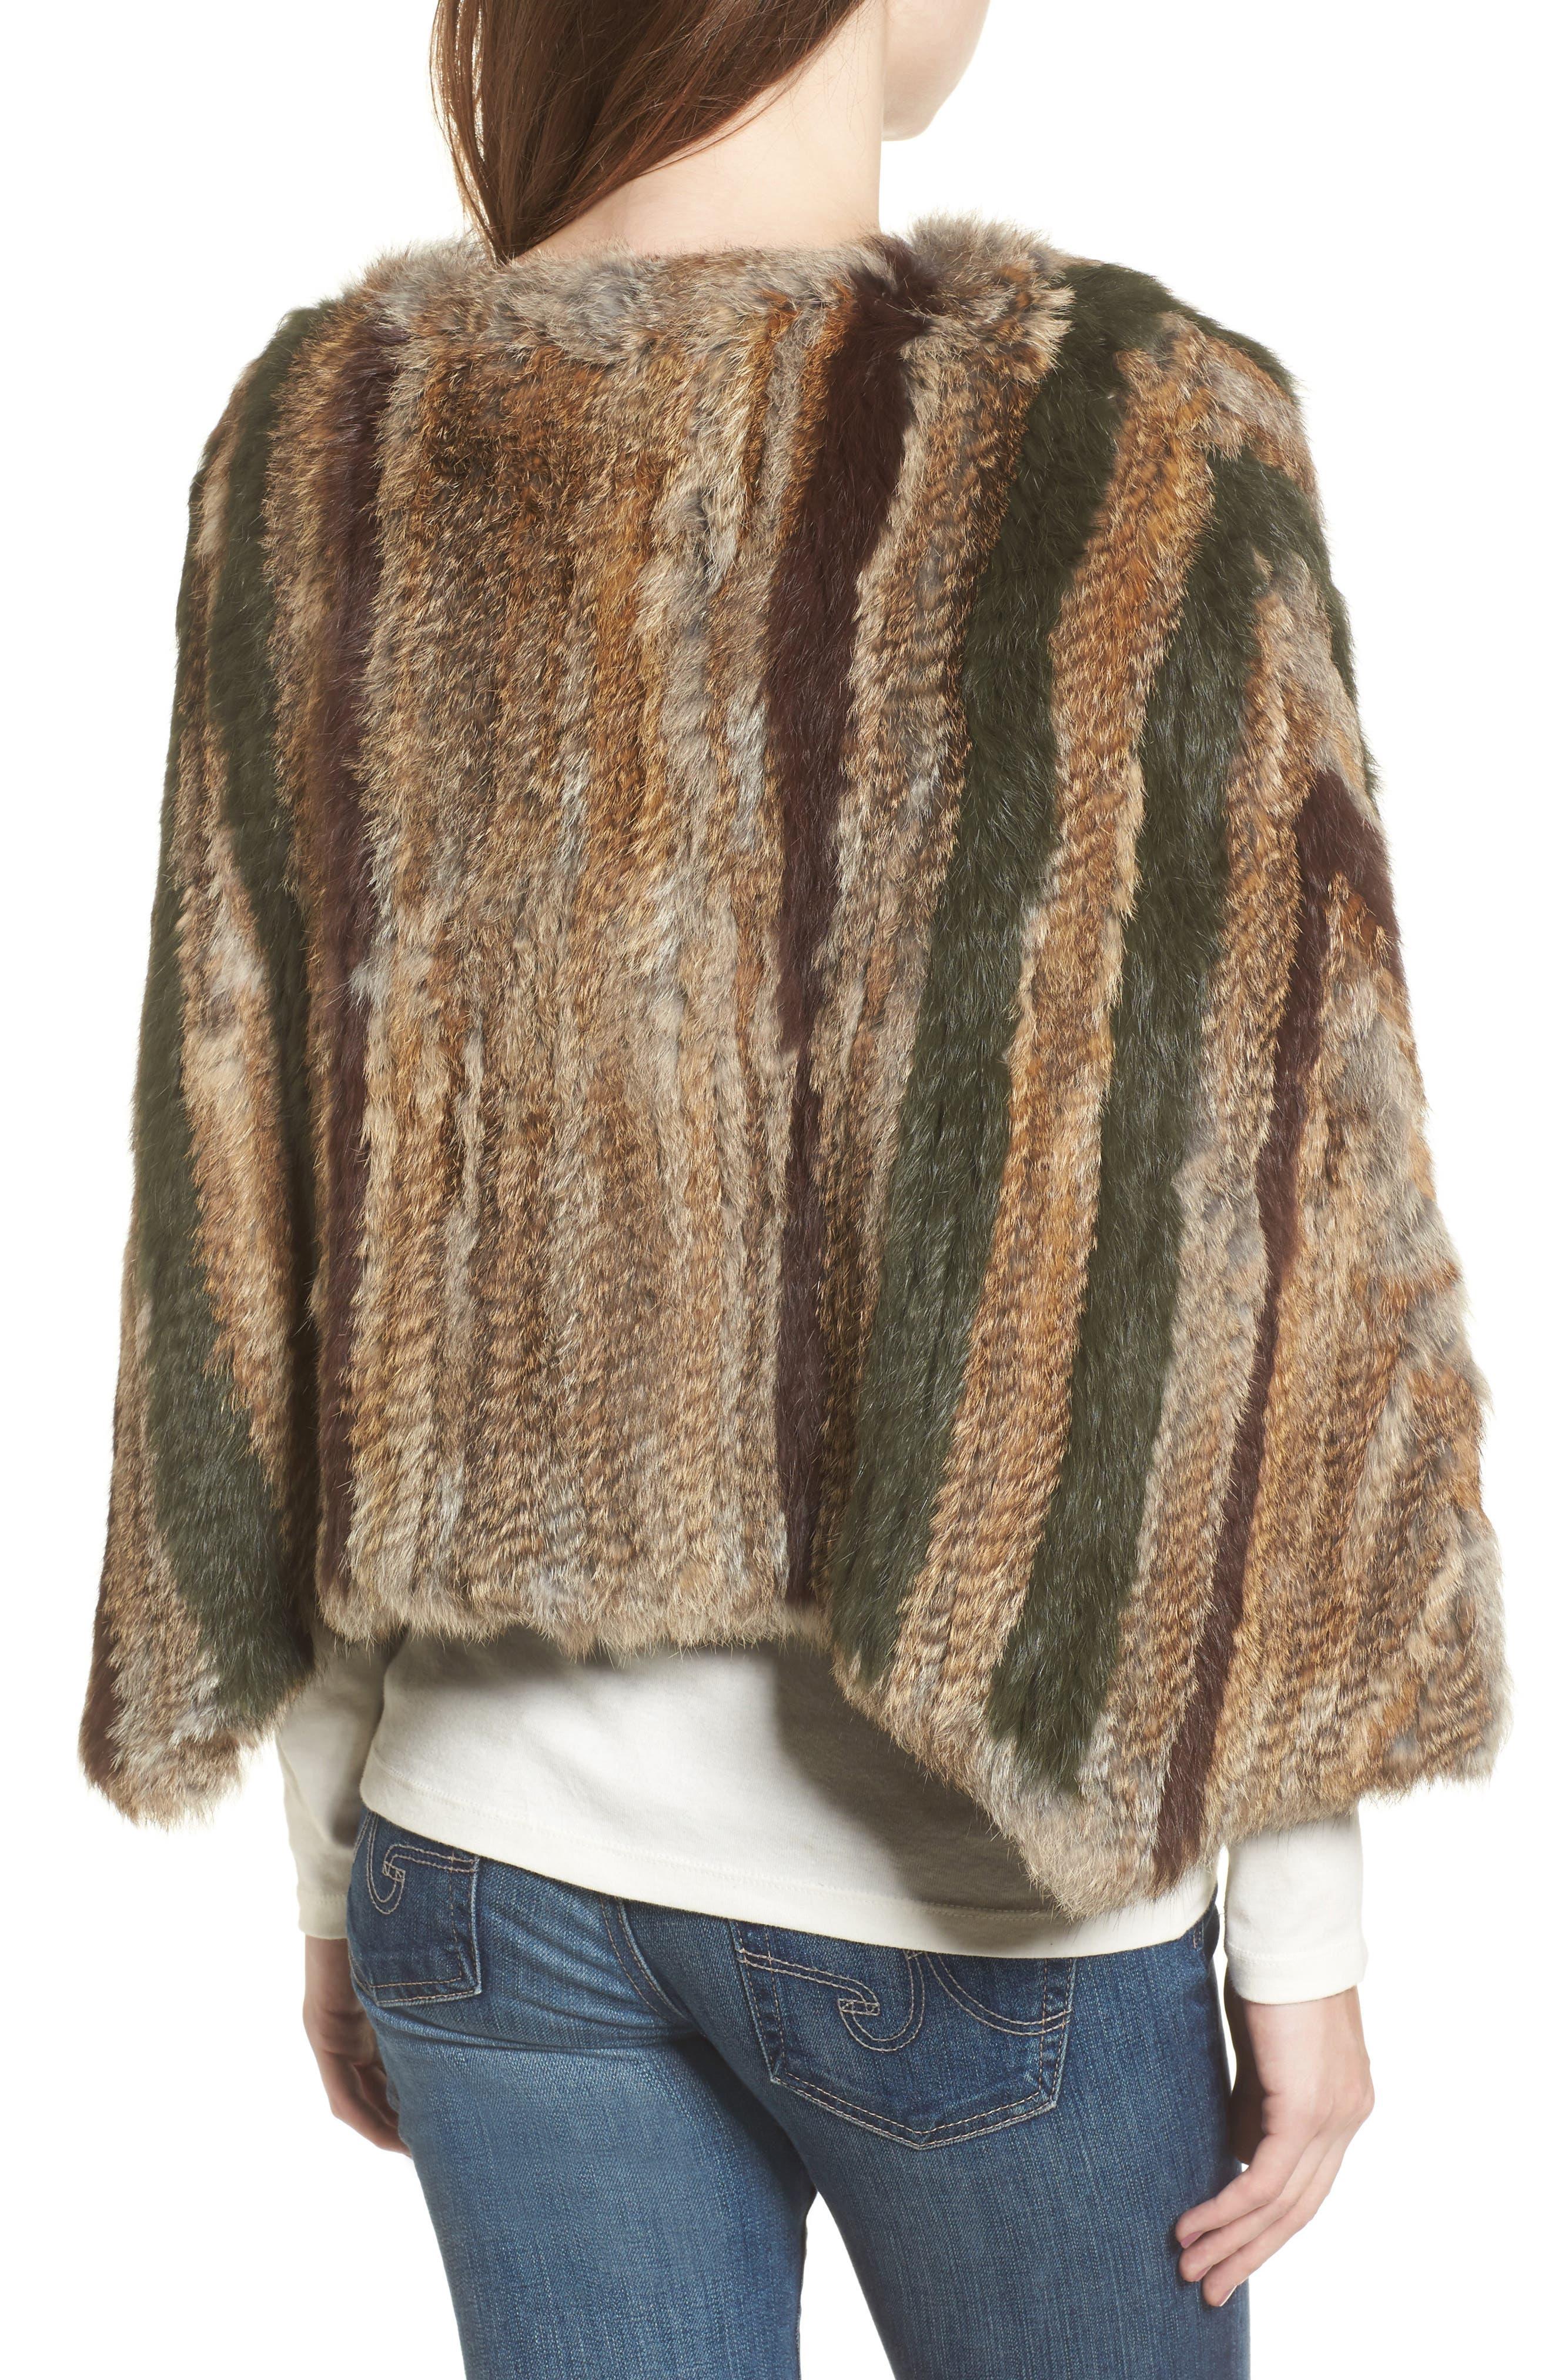 BNCI Nomad Genuine Rabbit Fur Pullover,                             Alternate thumbnail 2, color,                             208